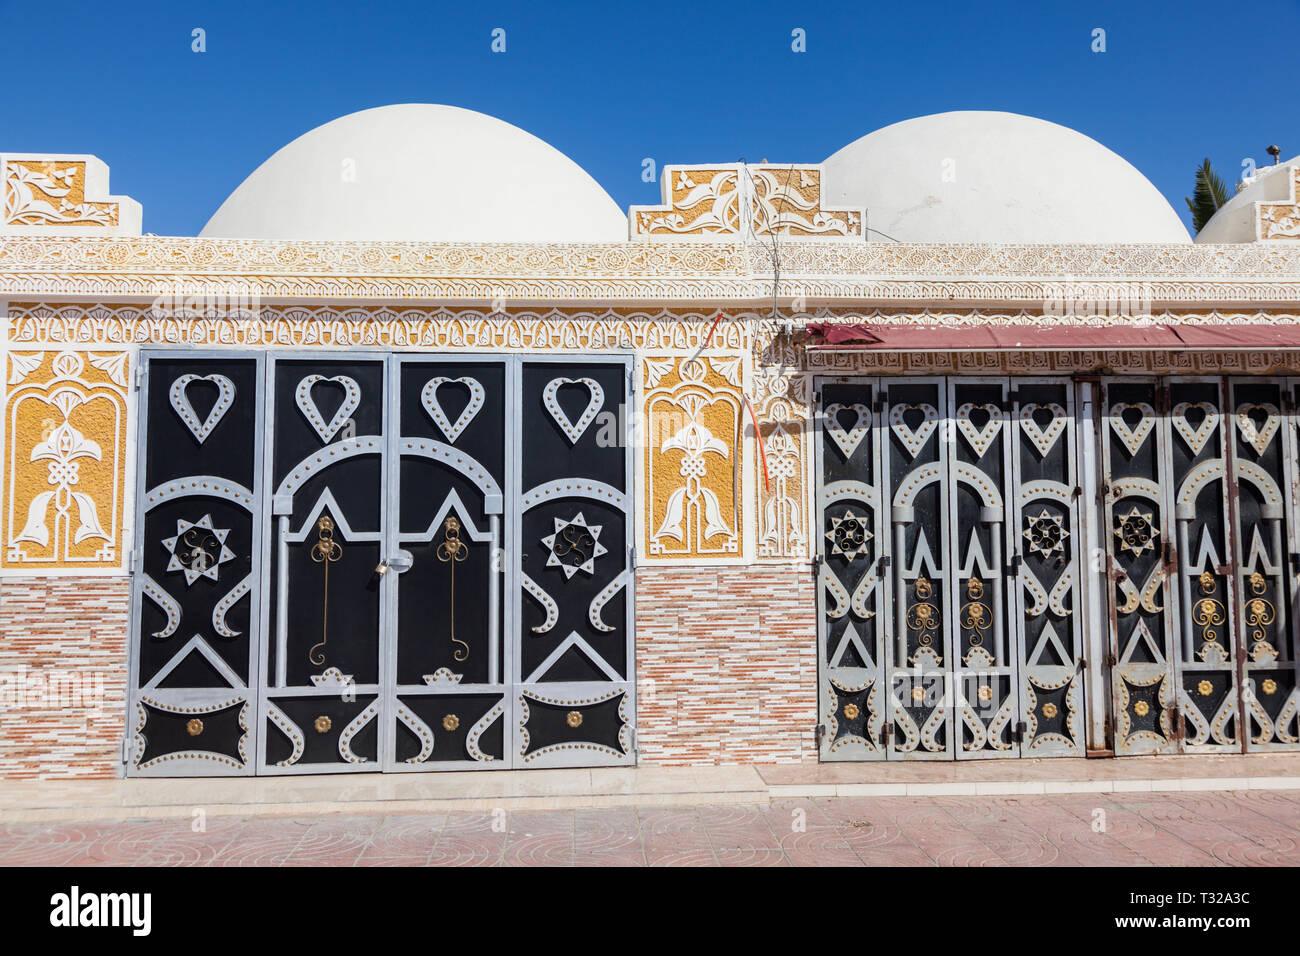 Jewelry souk in Laayoune. Laayoune, Western Sahara, Morocco. - Stock Image